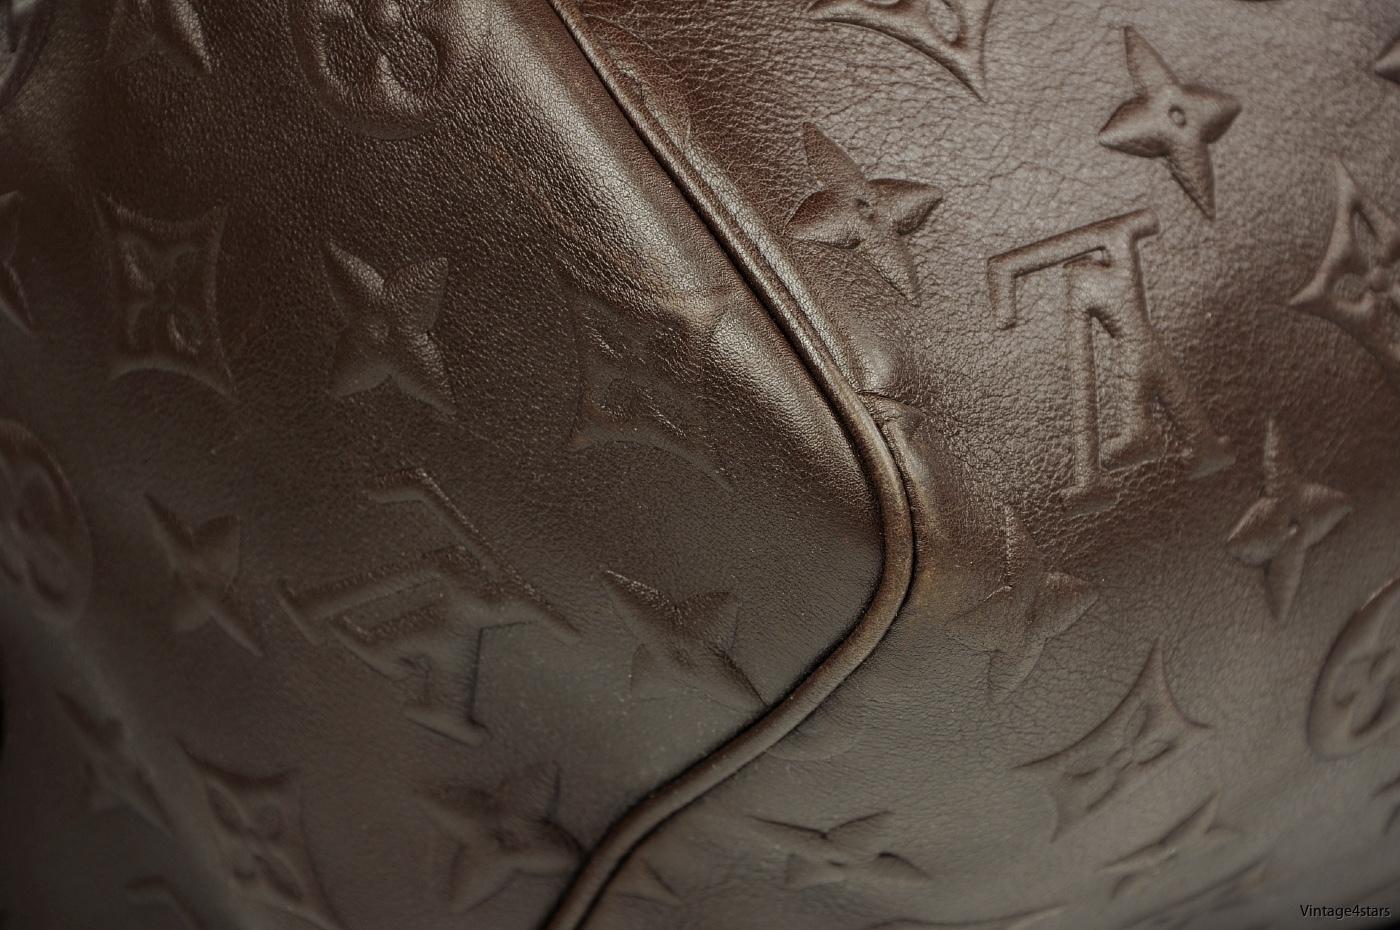 Louis Vuitton Keepall Edun 7-2